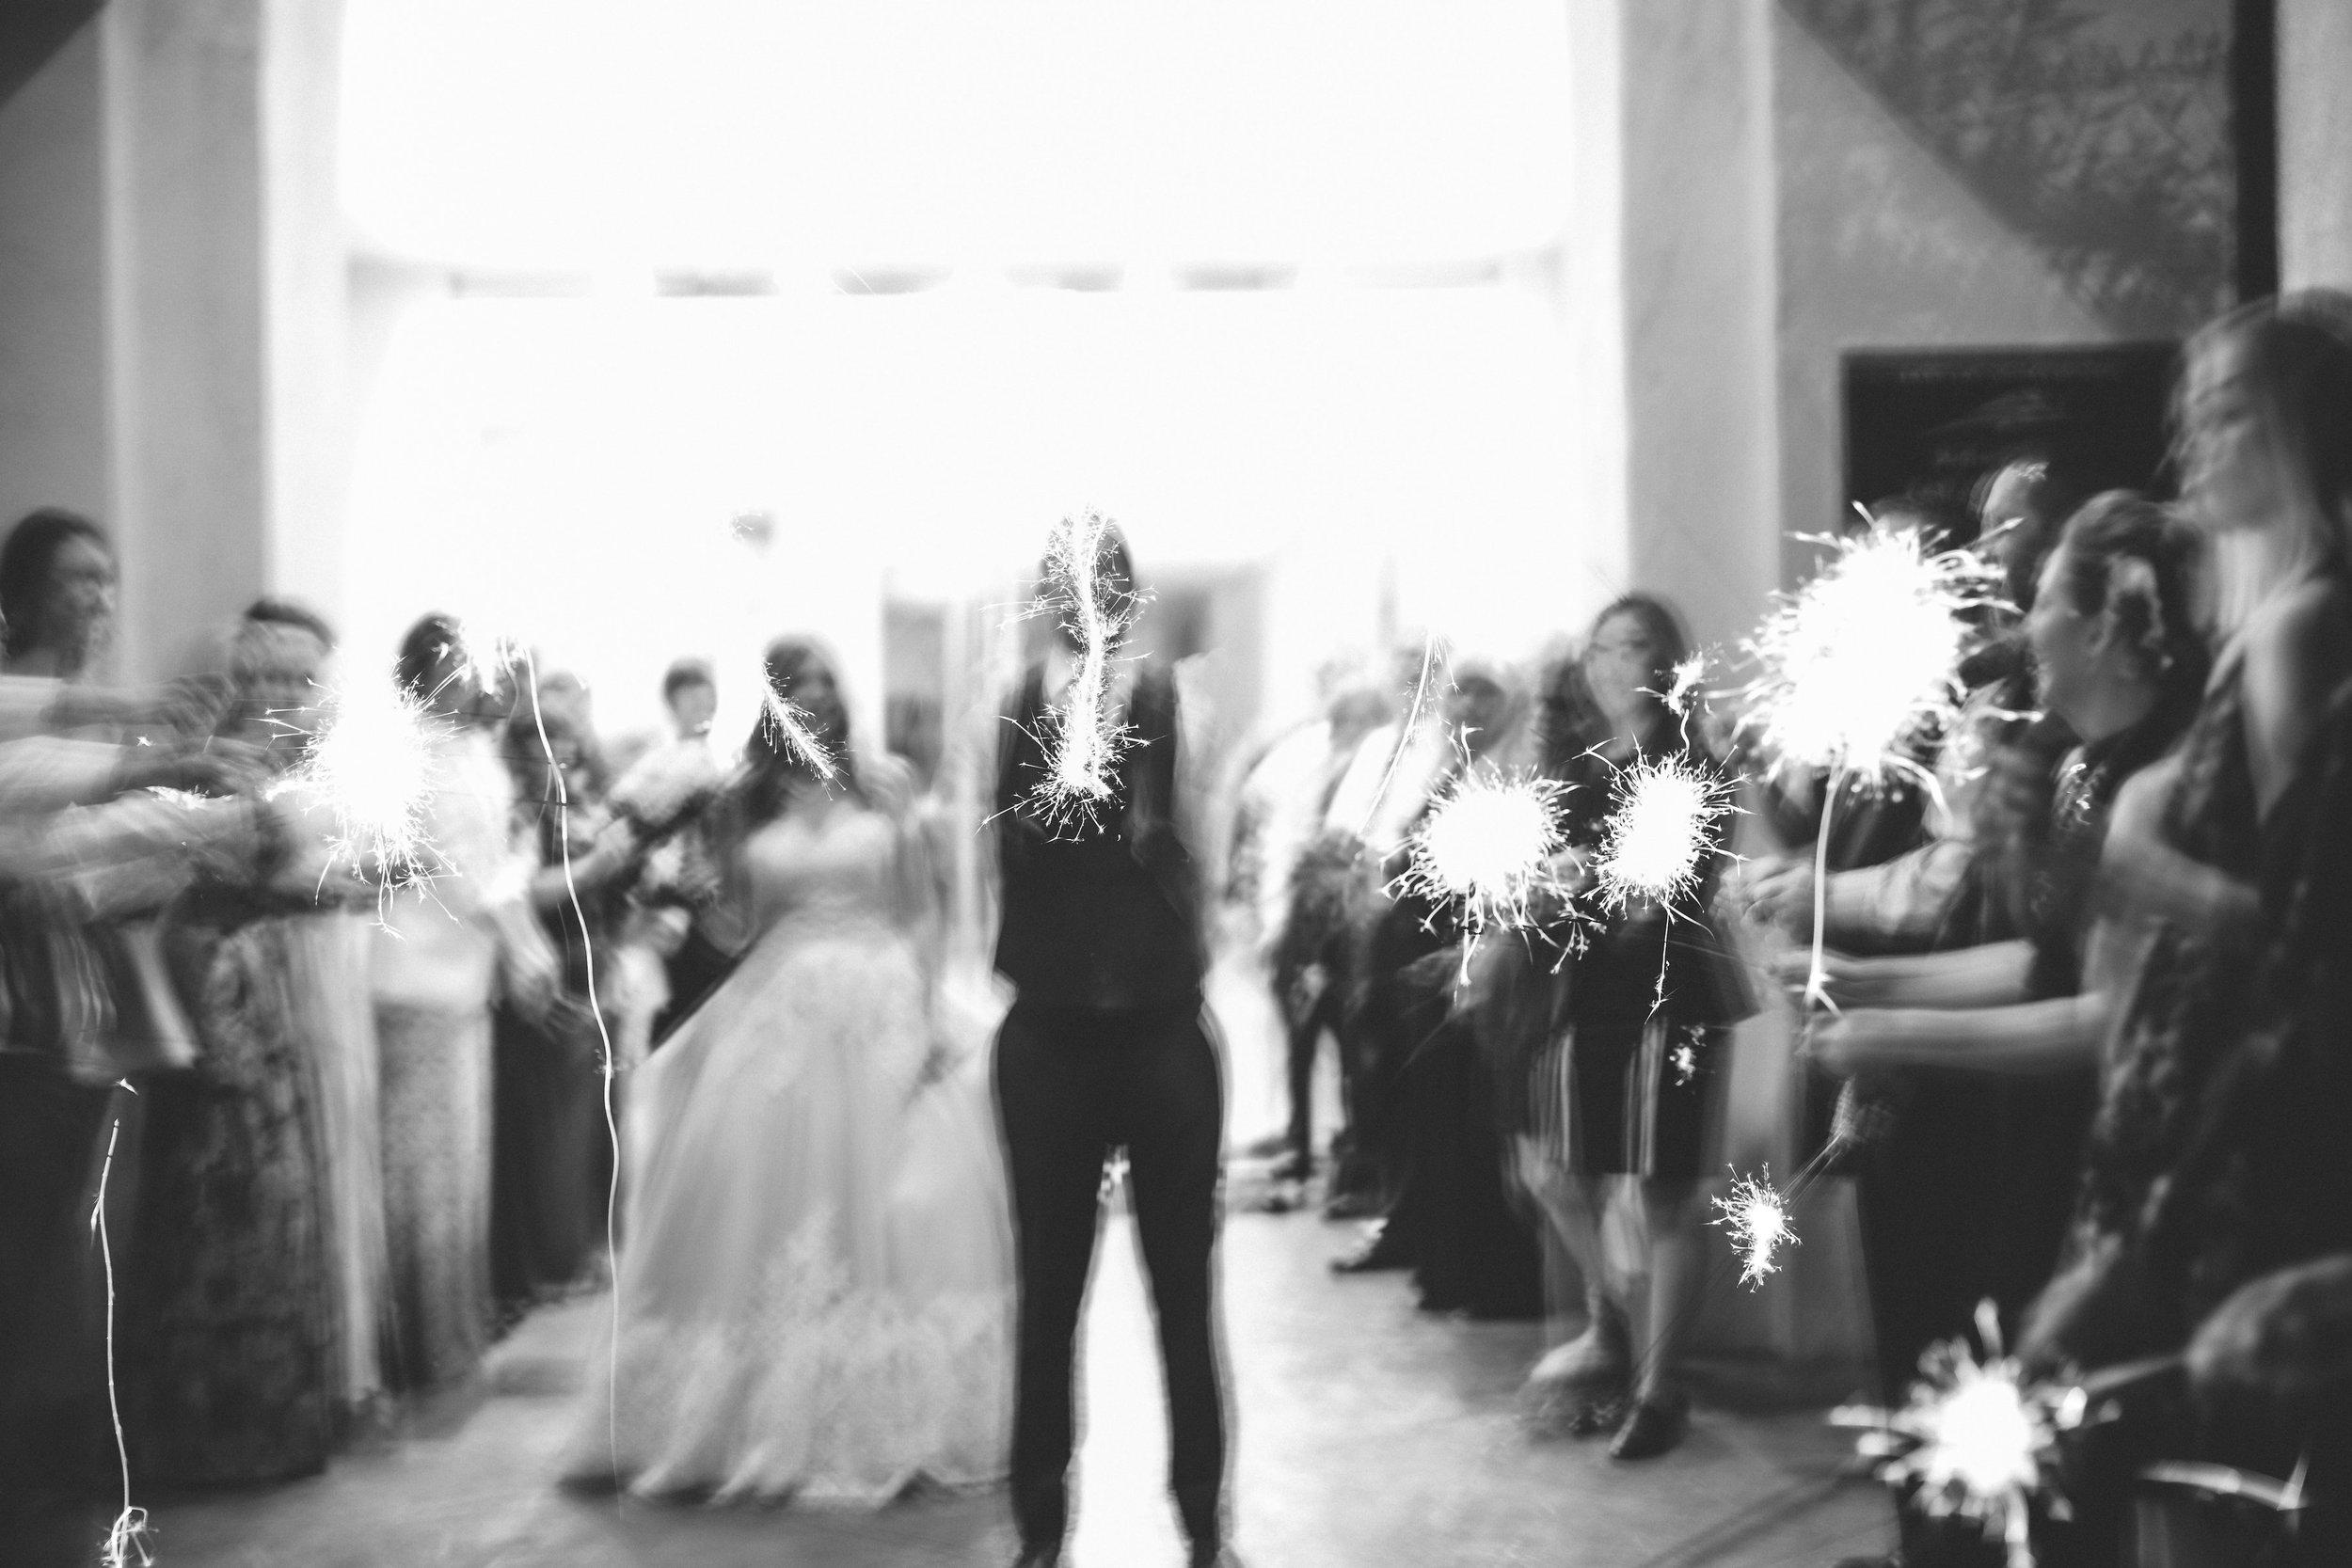 lindsey-and-ryan-intimate-winter-wedding46.jpg